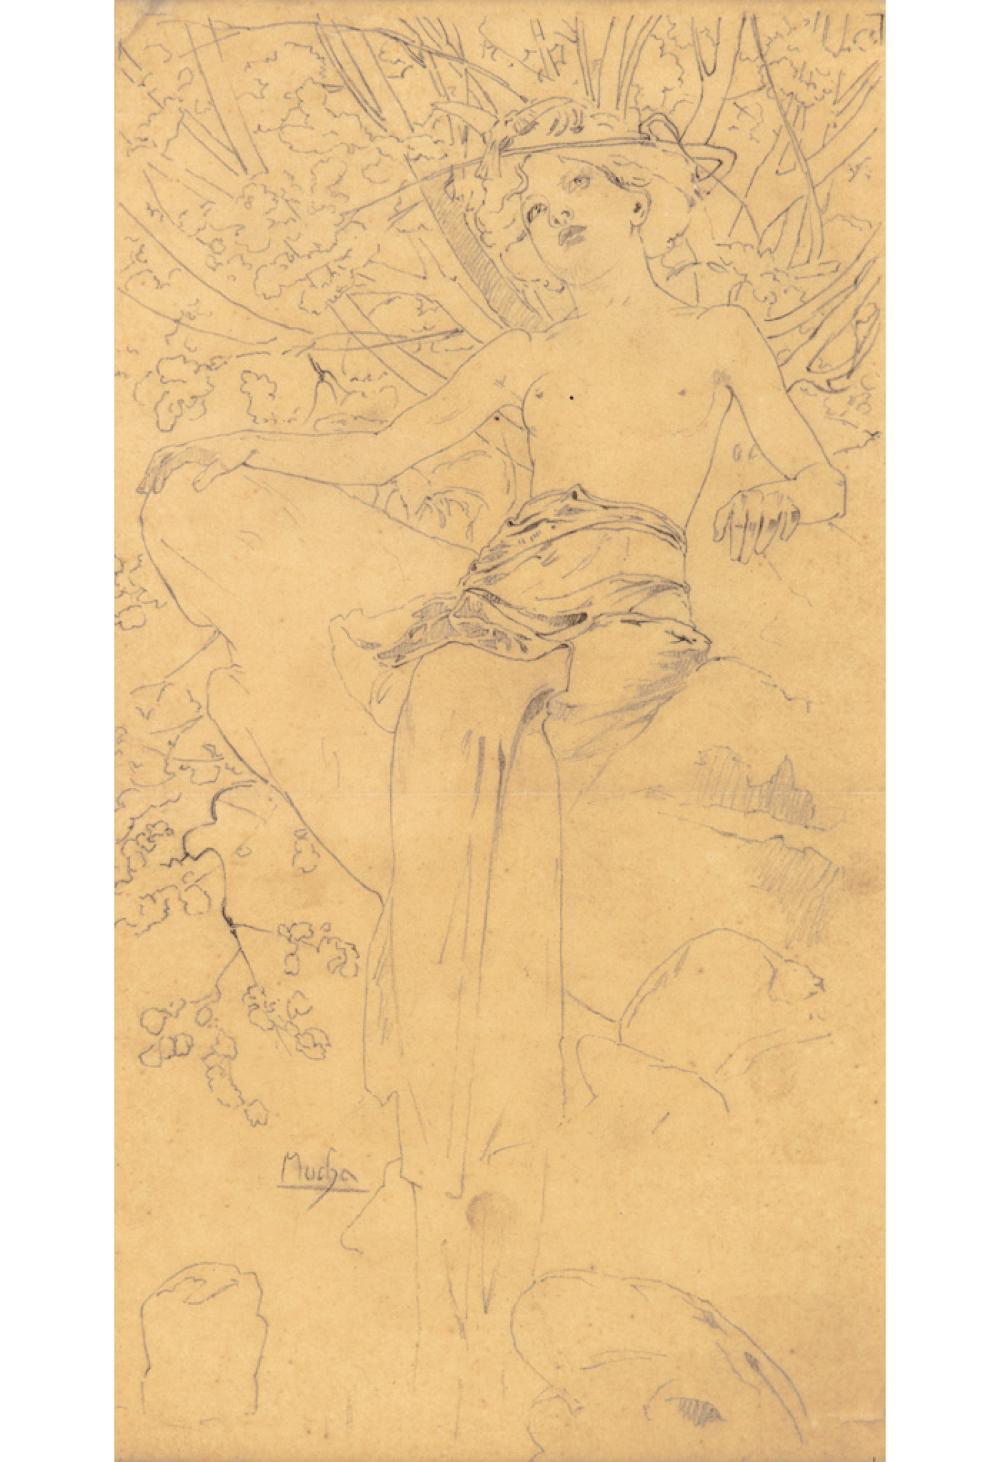 ALPHONSE MUCHA (1860-1939). [DOCUMENTS DÉCORATIFS.] Preparatory pencil sketch. Circa 1902. 14x7 inches, 35x19 cm.